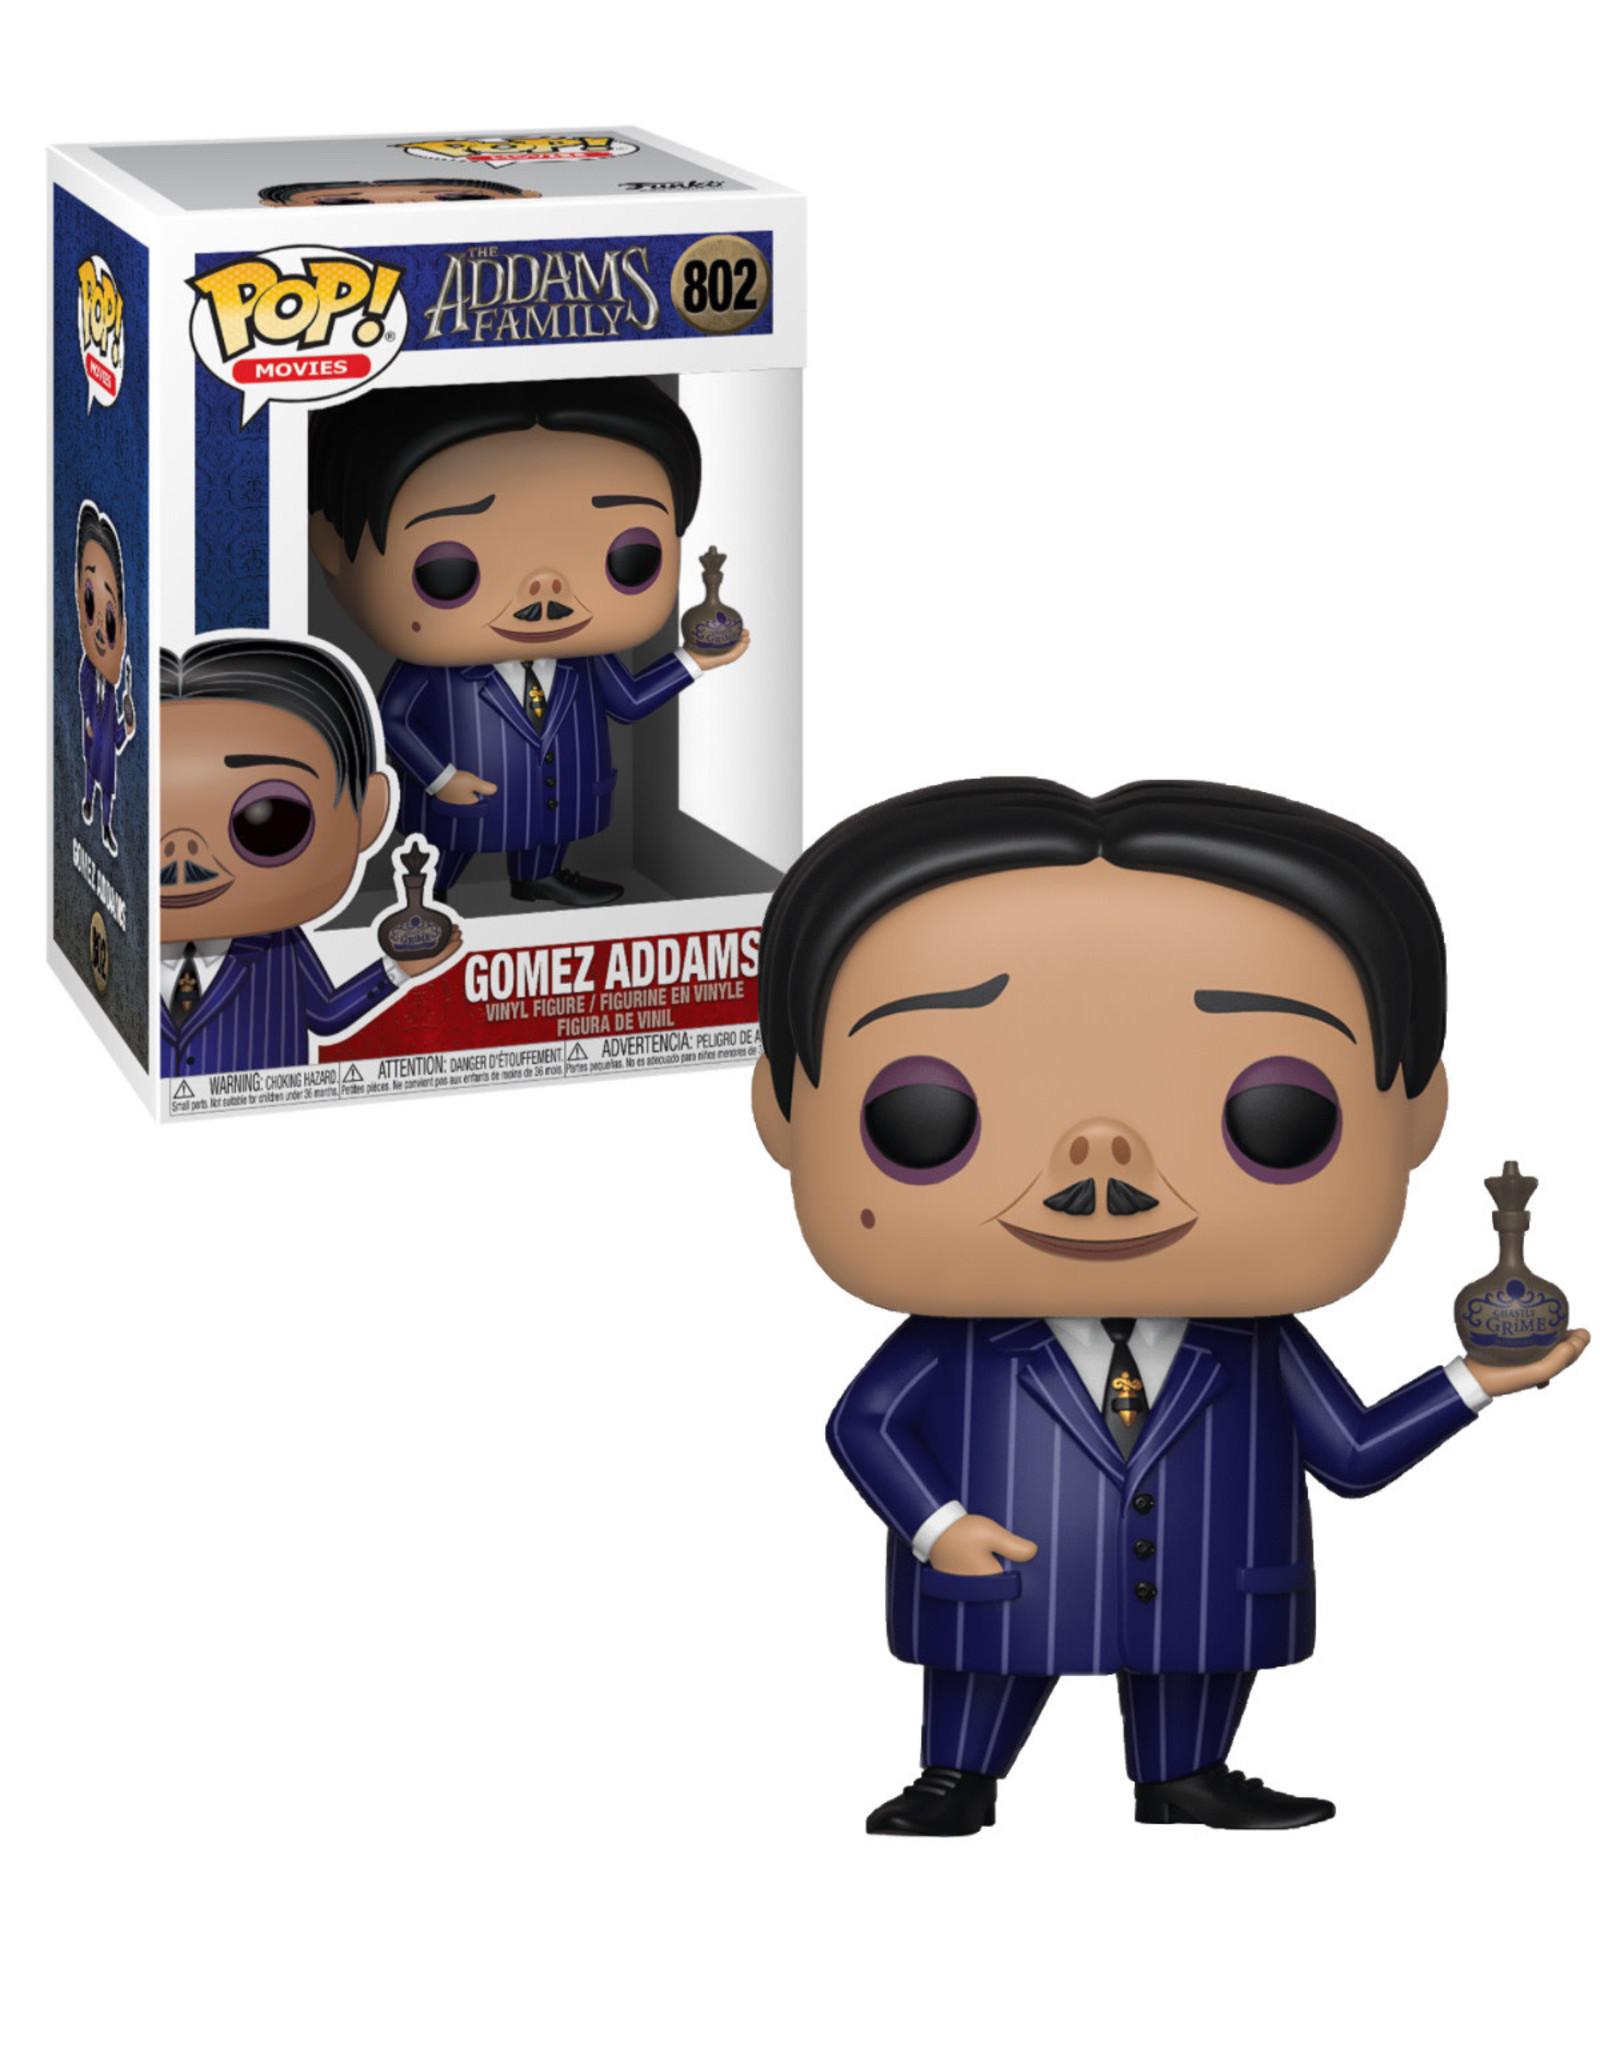 The Addams Family ( Funko Pop ) Gomez Addams